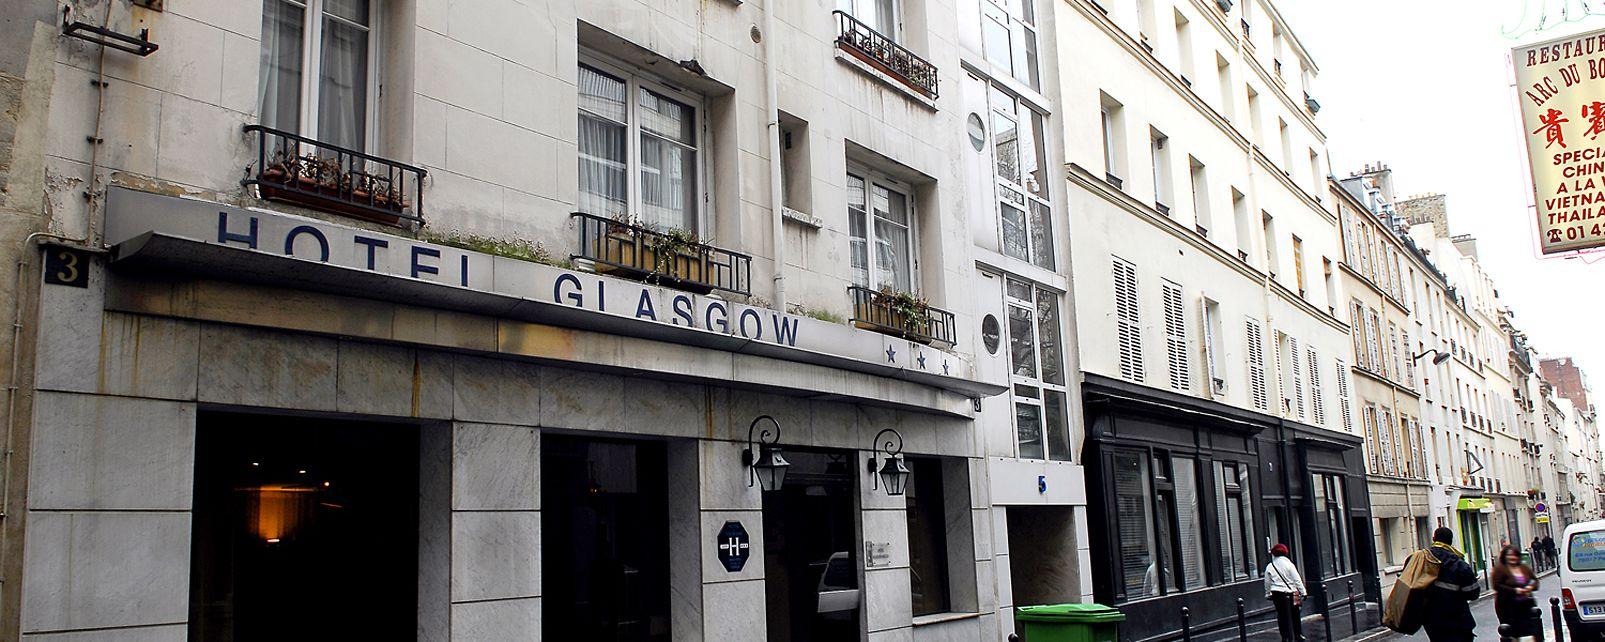 Hotel Glasgow